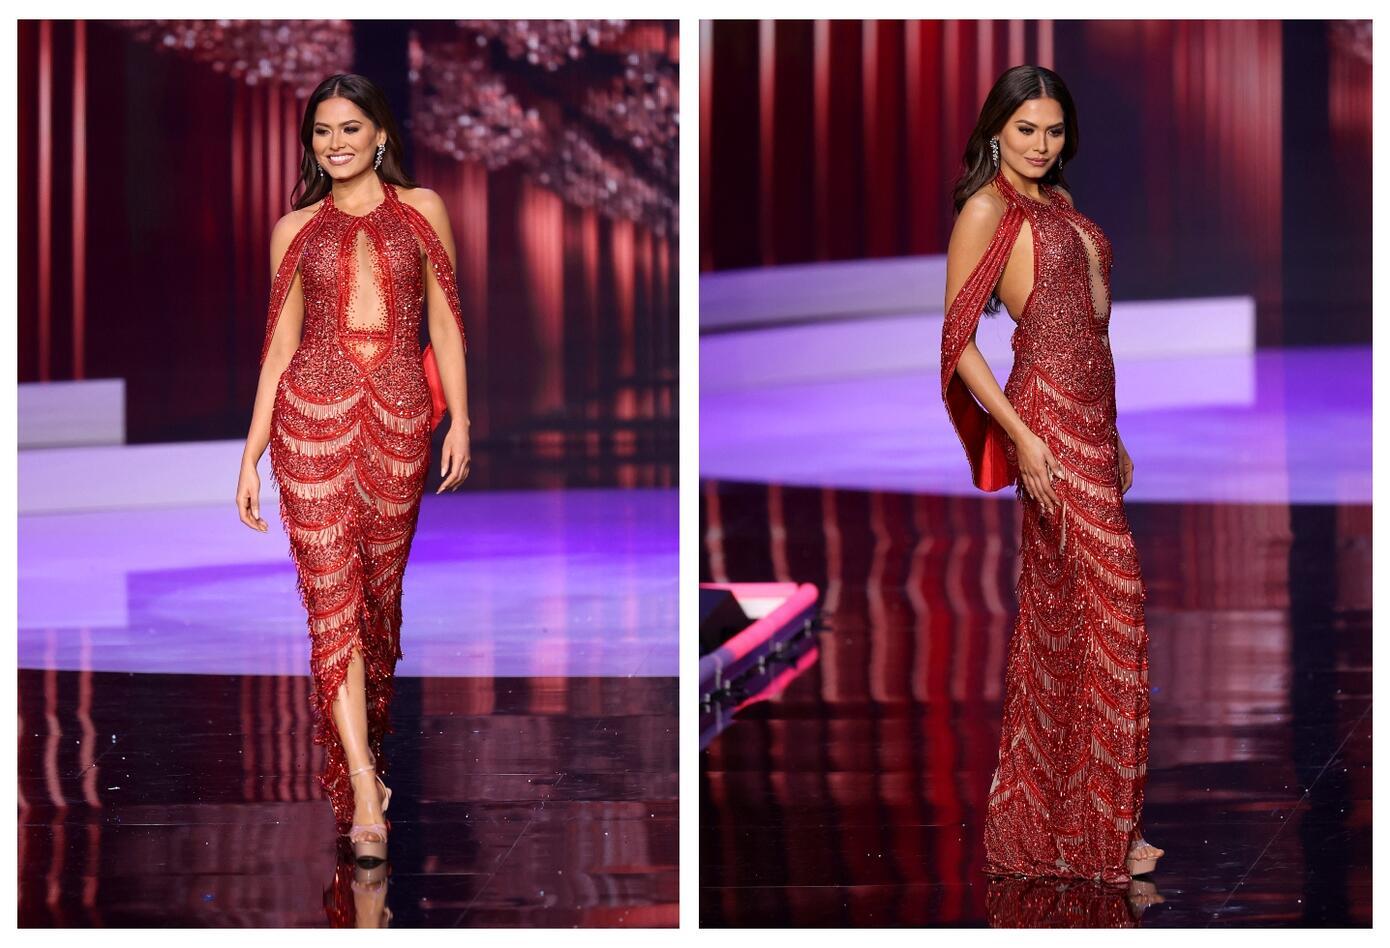 Vestido de Miss México, Andrea Meza, coronada como Miss Universo 2020